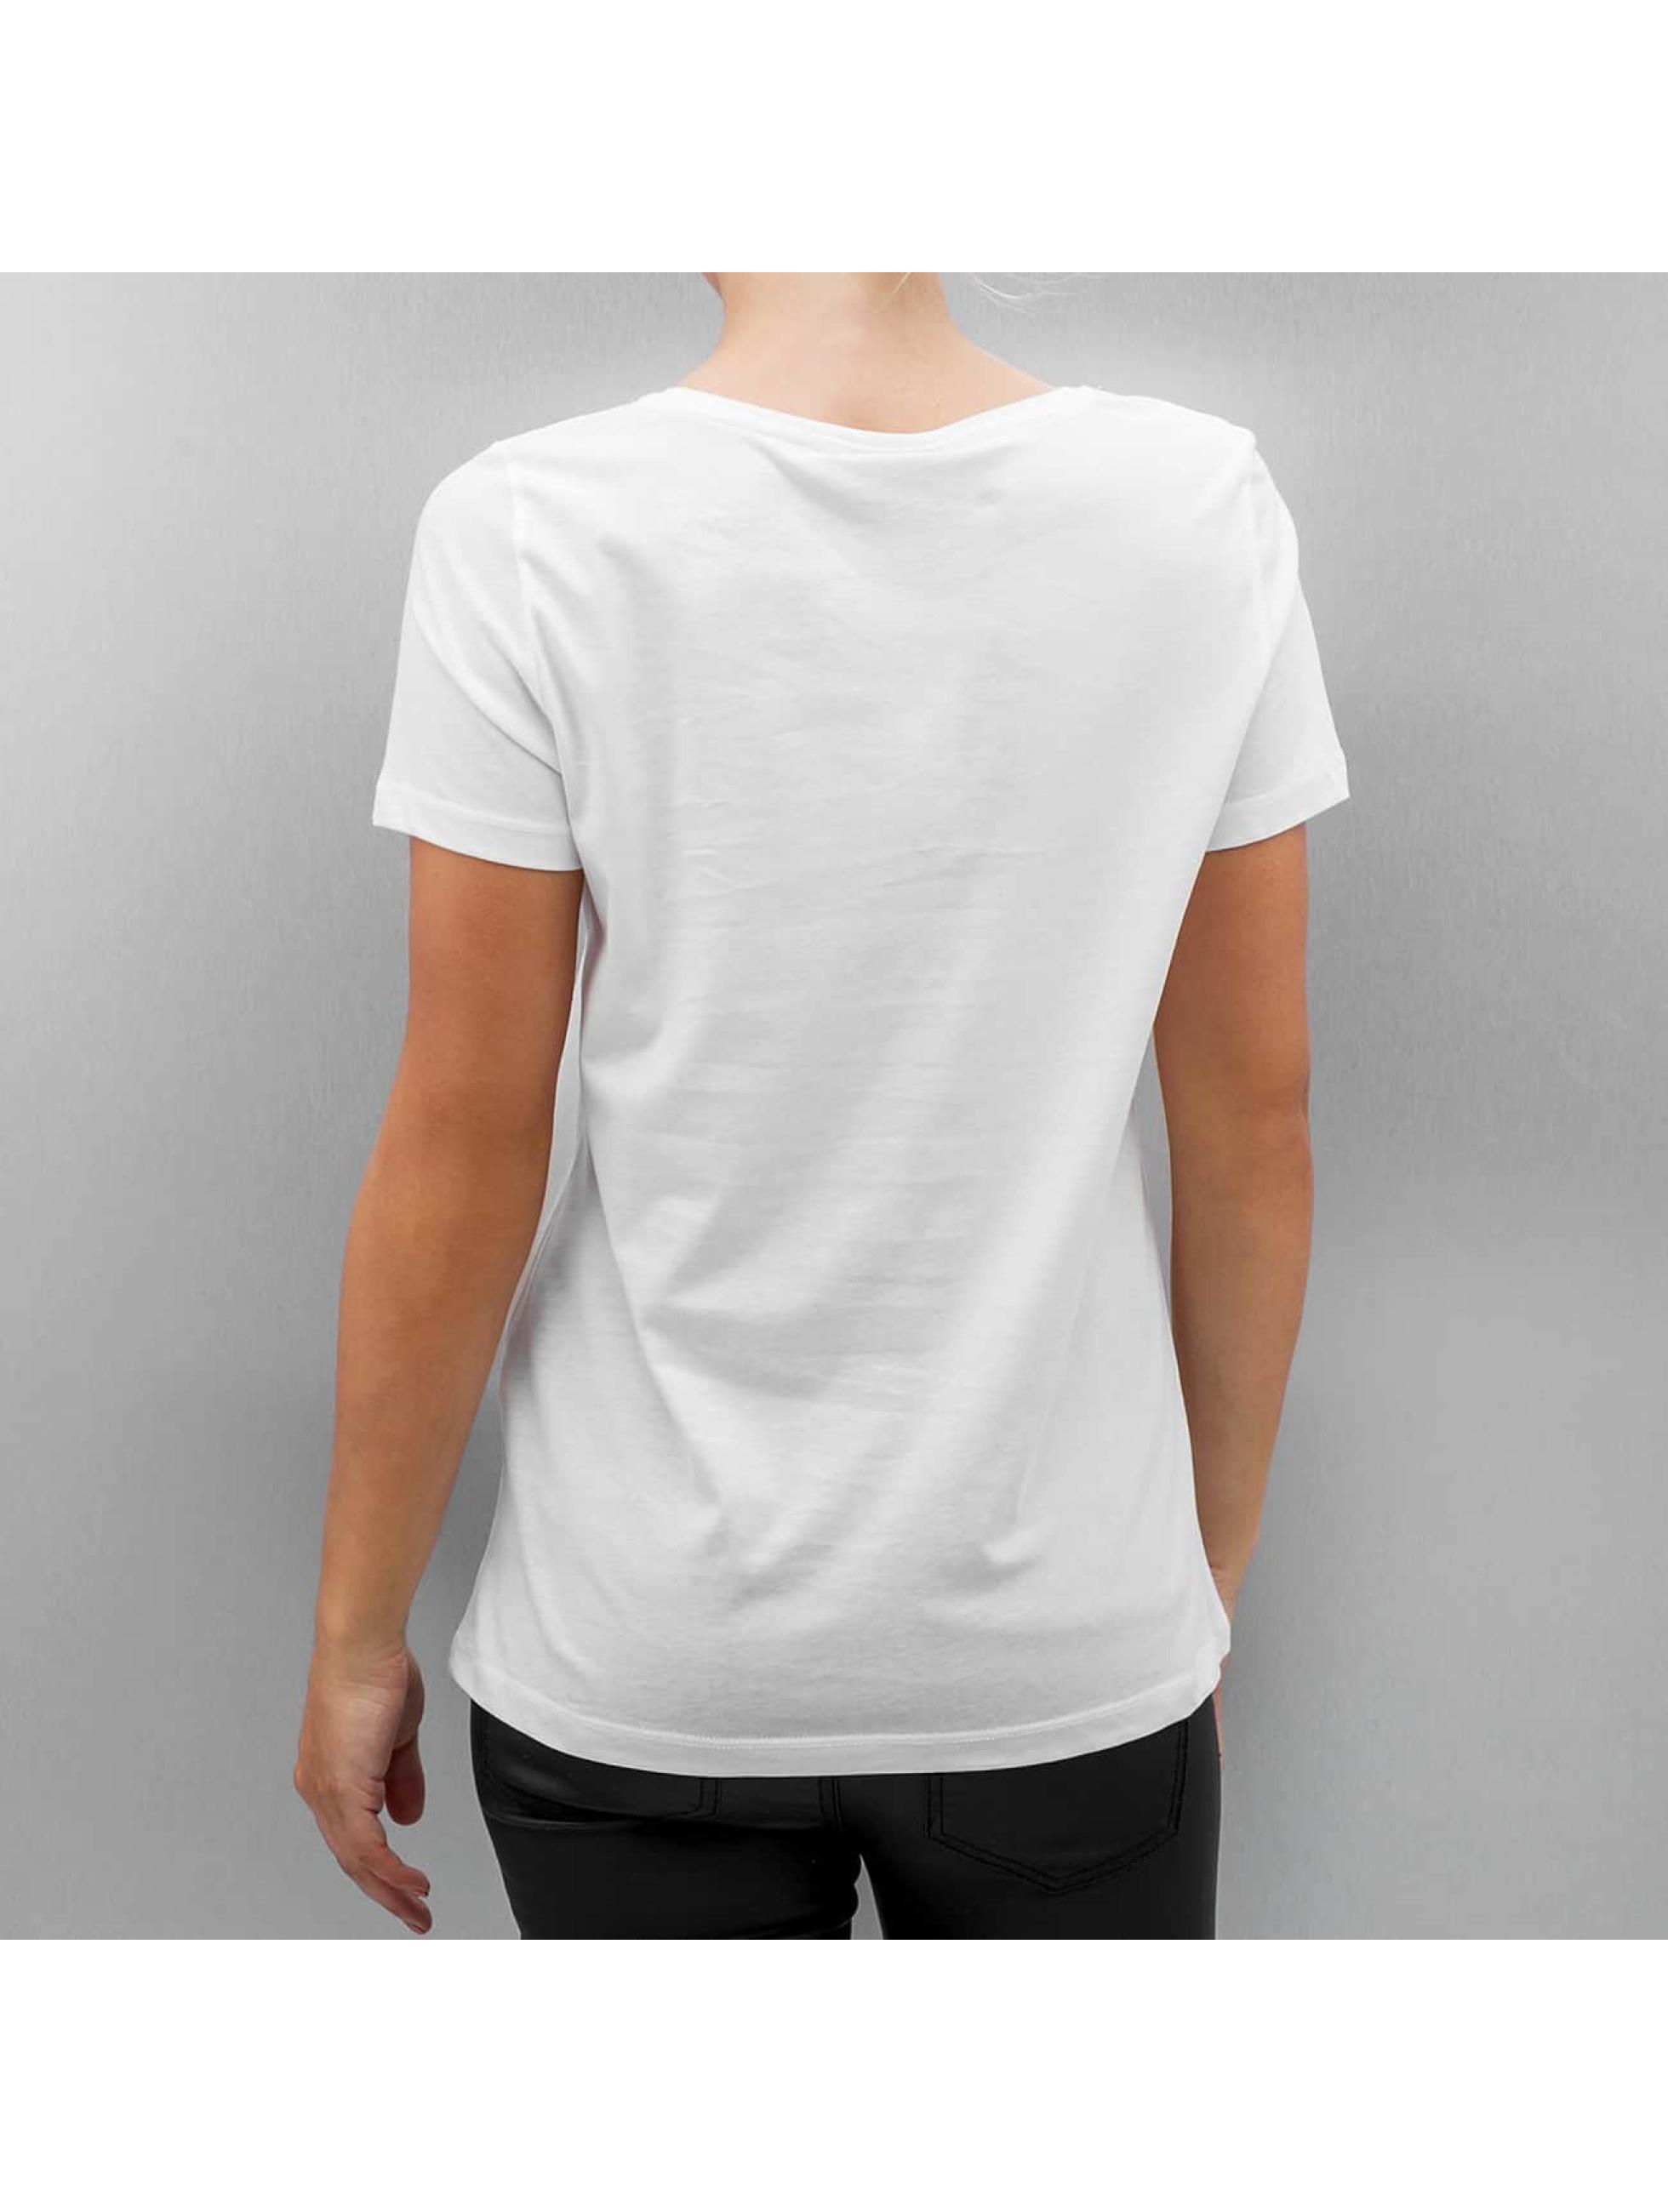 Vero Moda Camiseta VmMy blanco